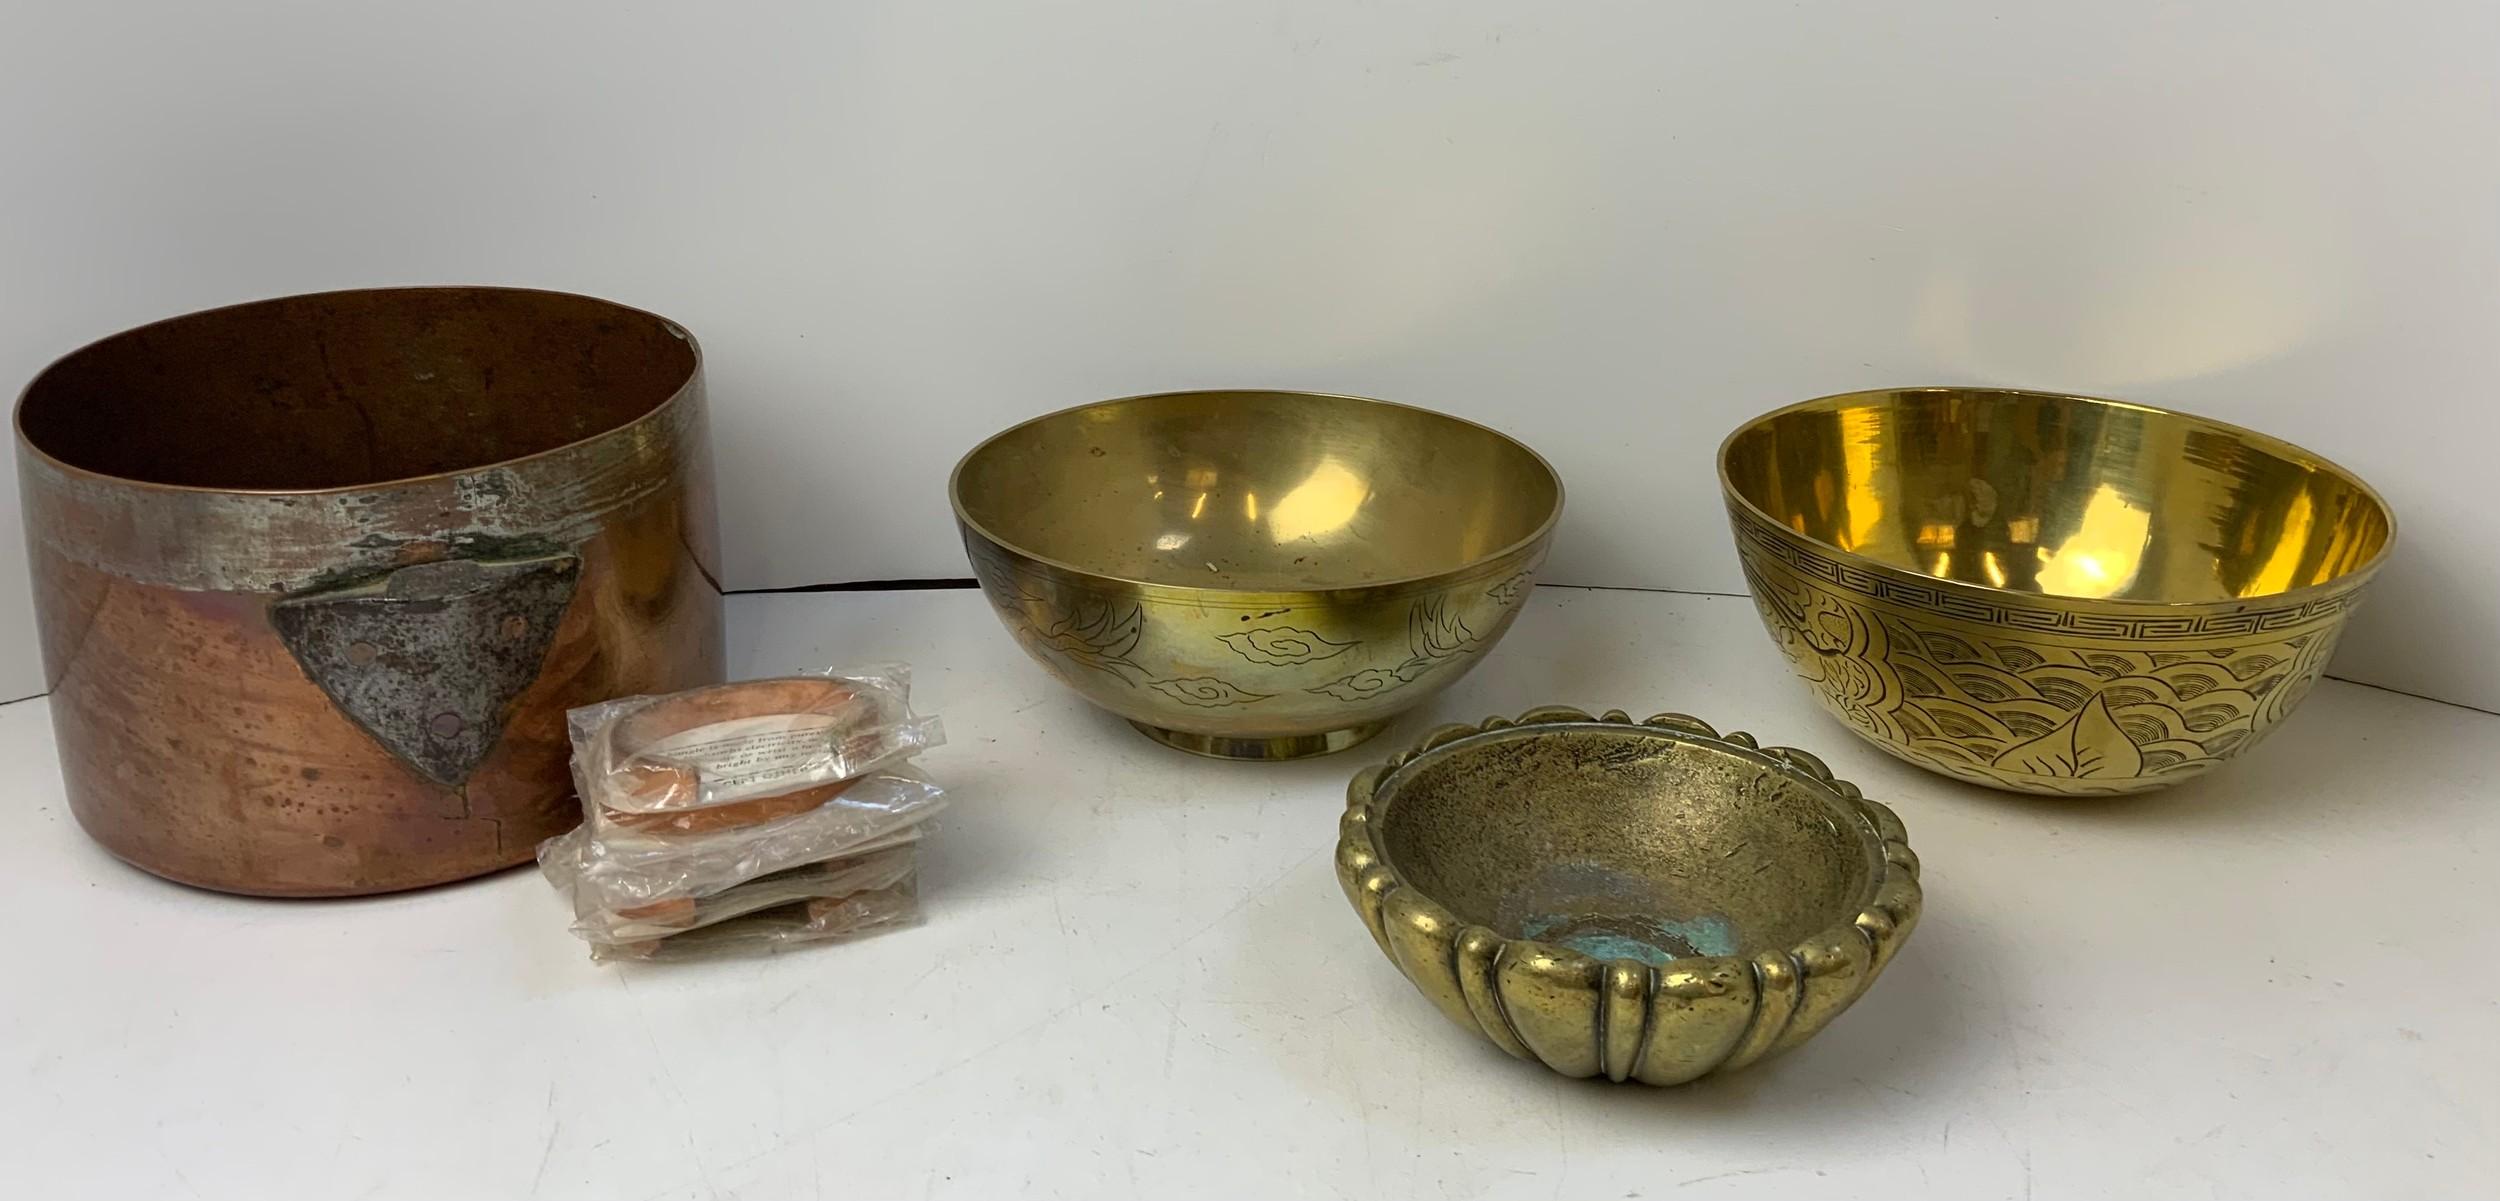 Copper Saucepan (No Handle), 2x Oriental Brass Bowls and Heavy Brass Bowl